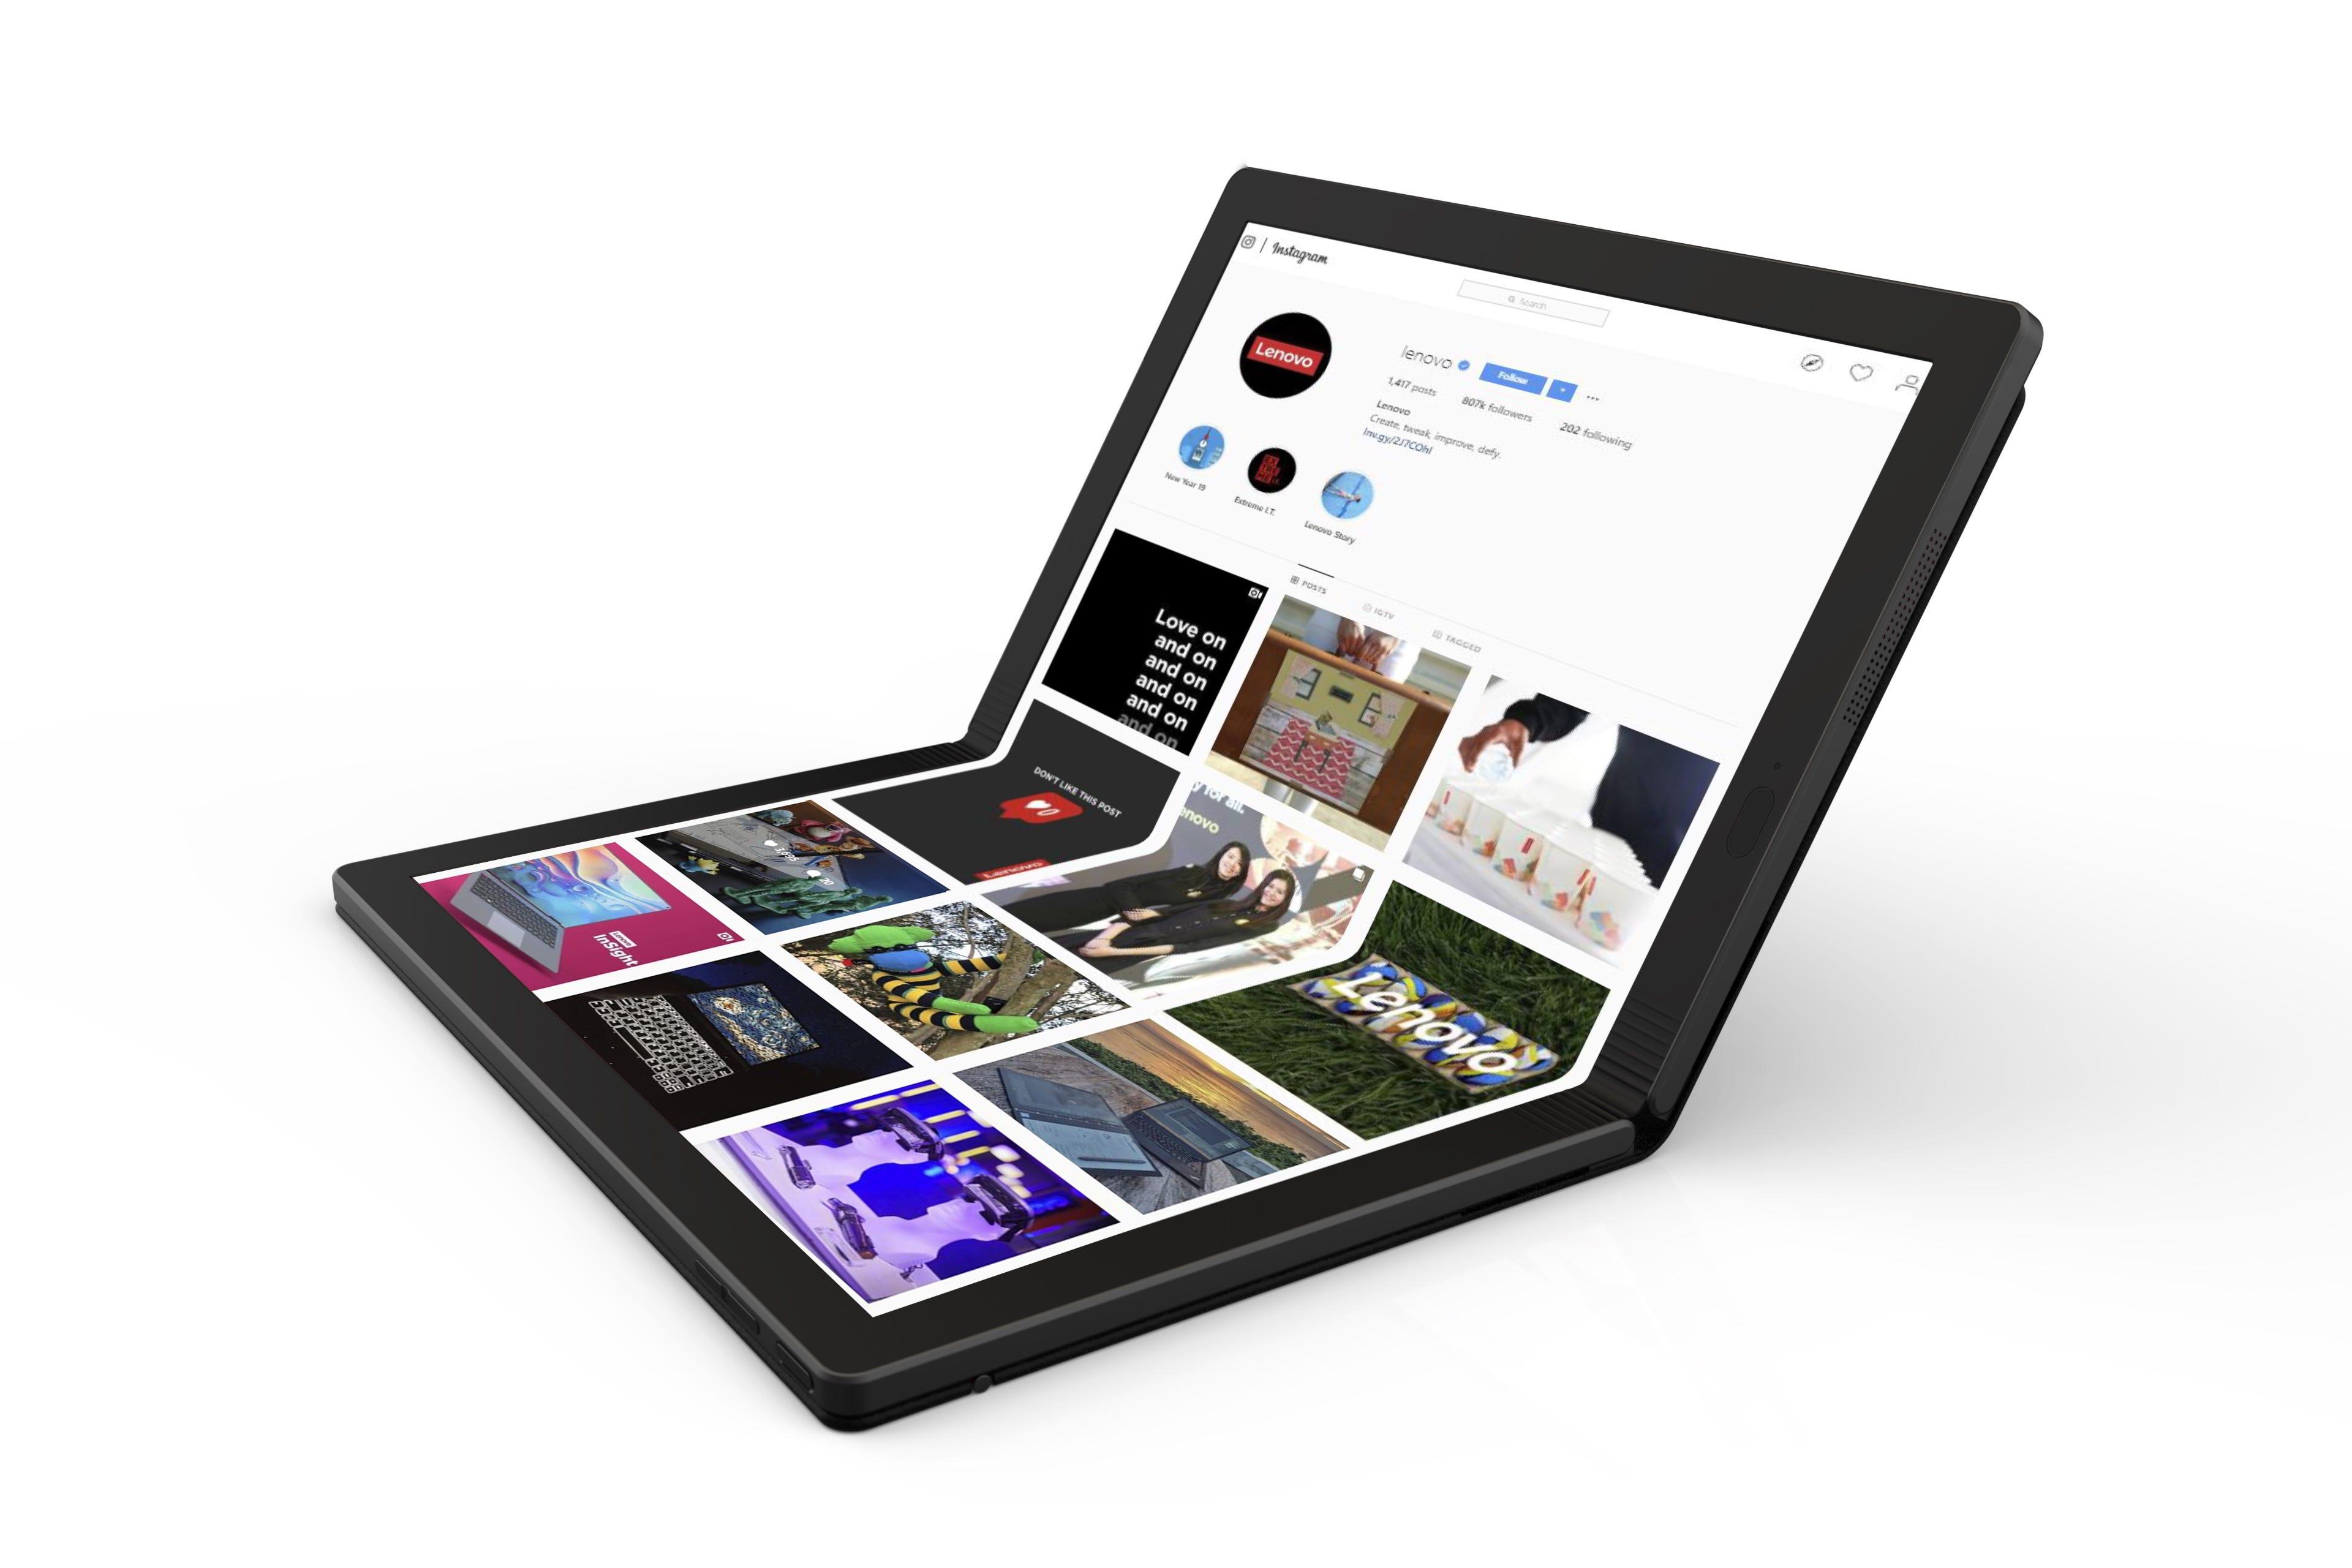 The display on this Lenovo ThinkPad prototype folds.